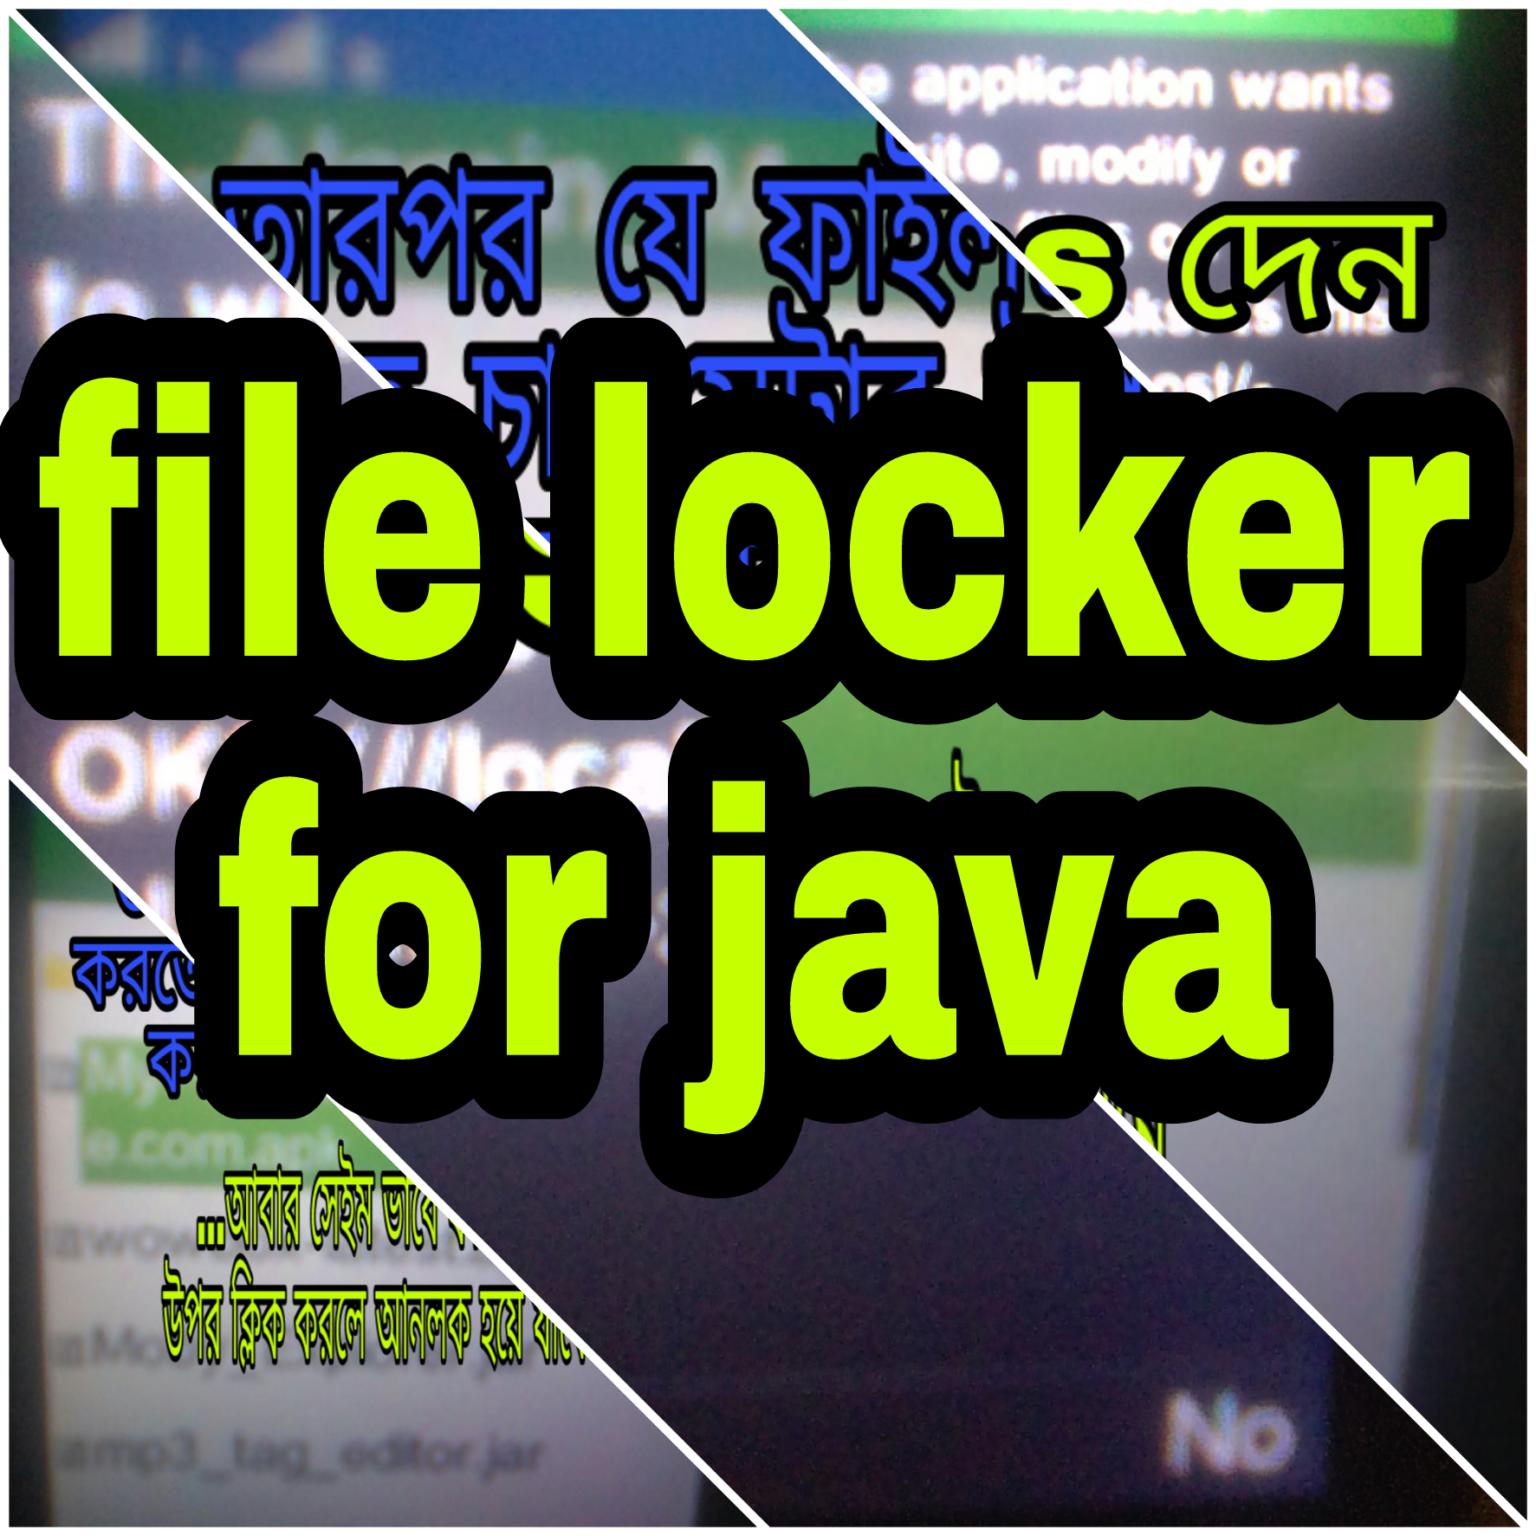 java ফোনের জন্য নিয়ে নিন ফাইল লকার app,,,just one click for locking or unlocking